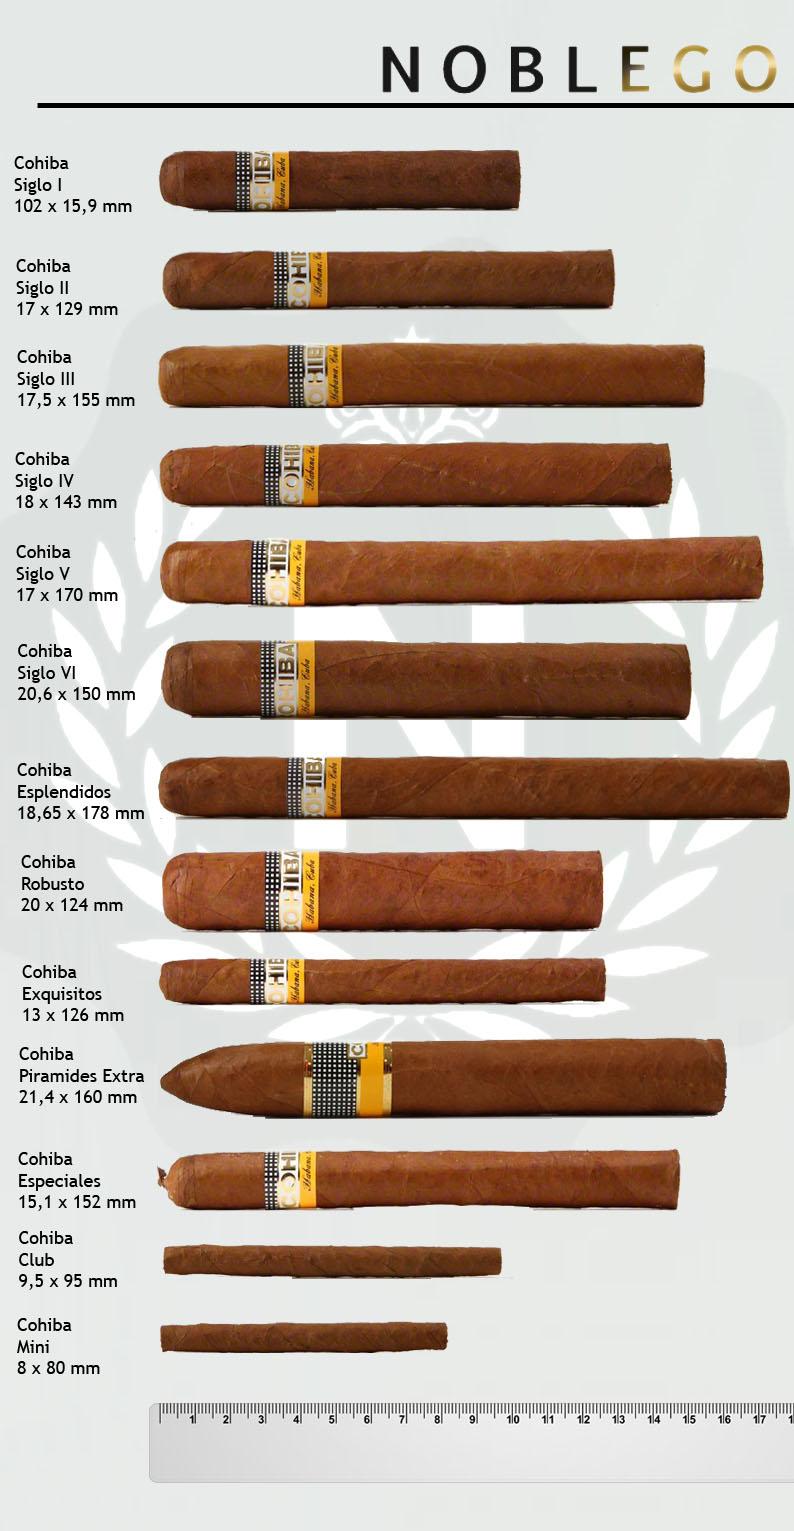 Cohiba Zigarren im Überblick